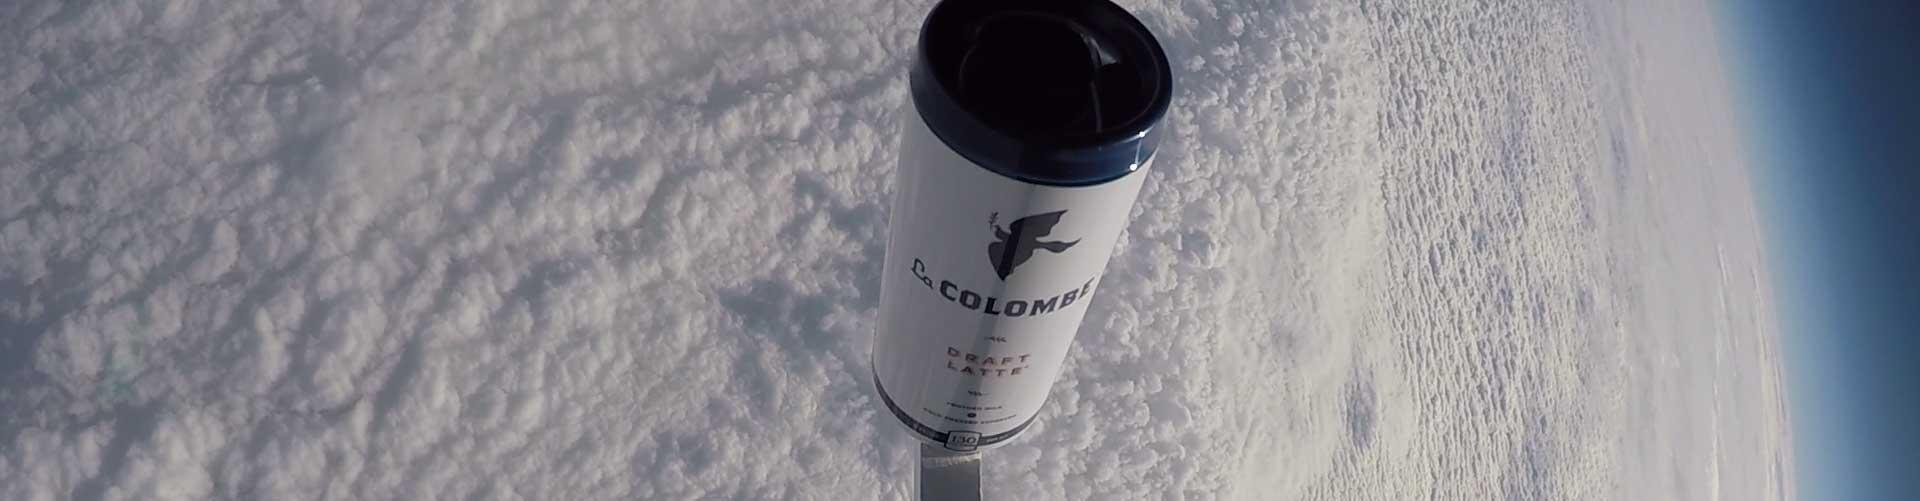 High Altitude Brand Activation